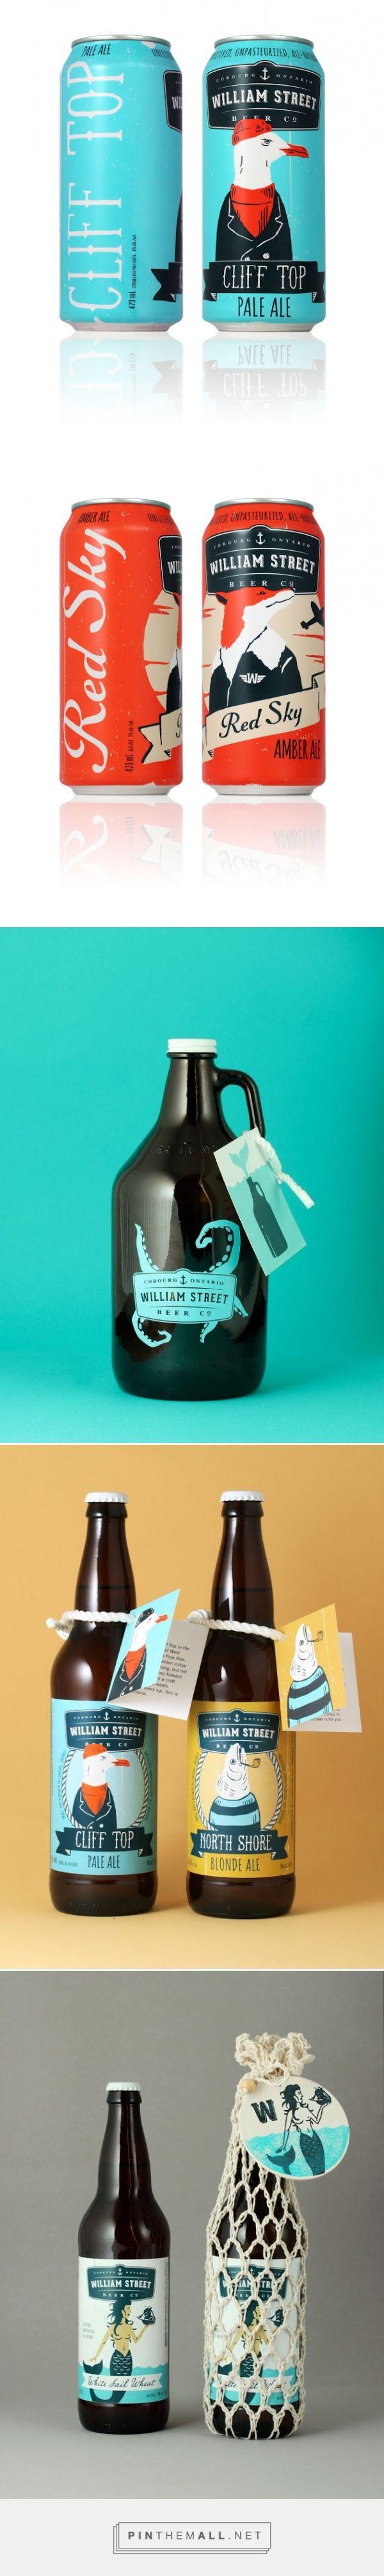 William Street Beer Co. packaging designed by Freshly Packaged - http://www.packagingoftheworld.com/2015/09/william-street-beer-co.html